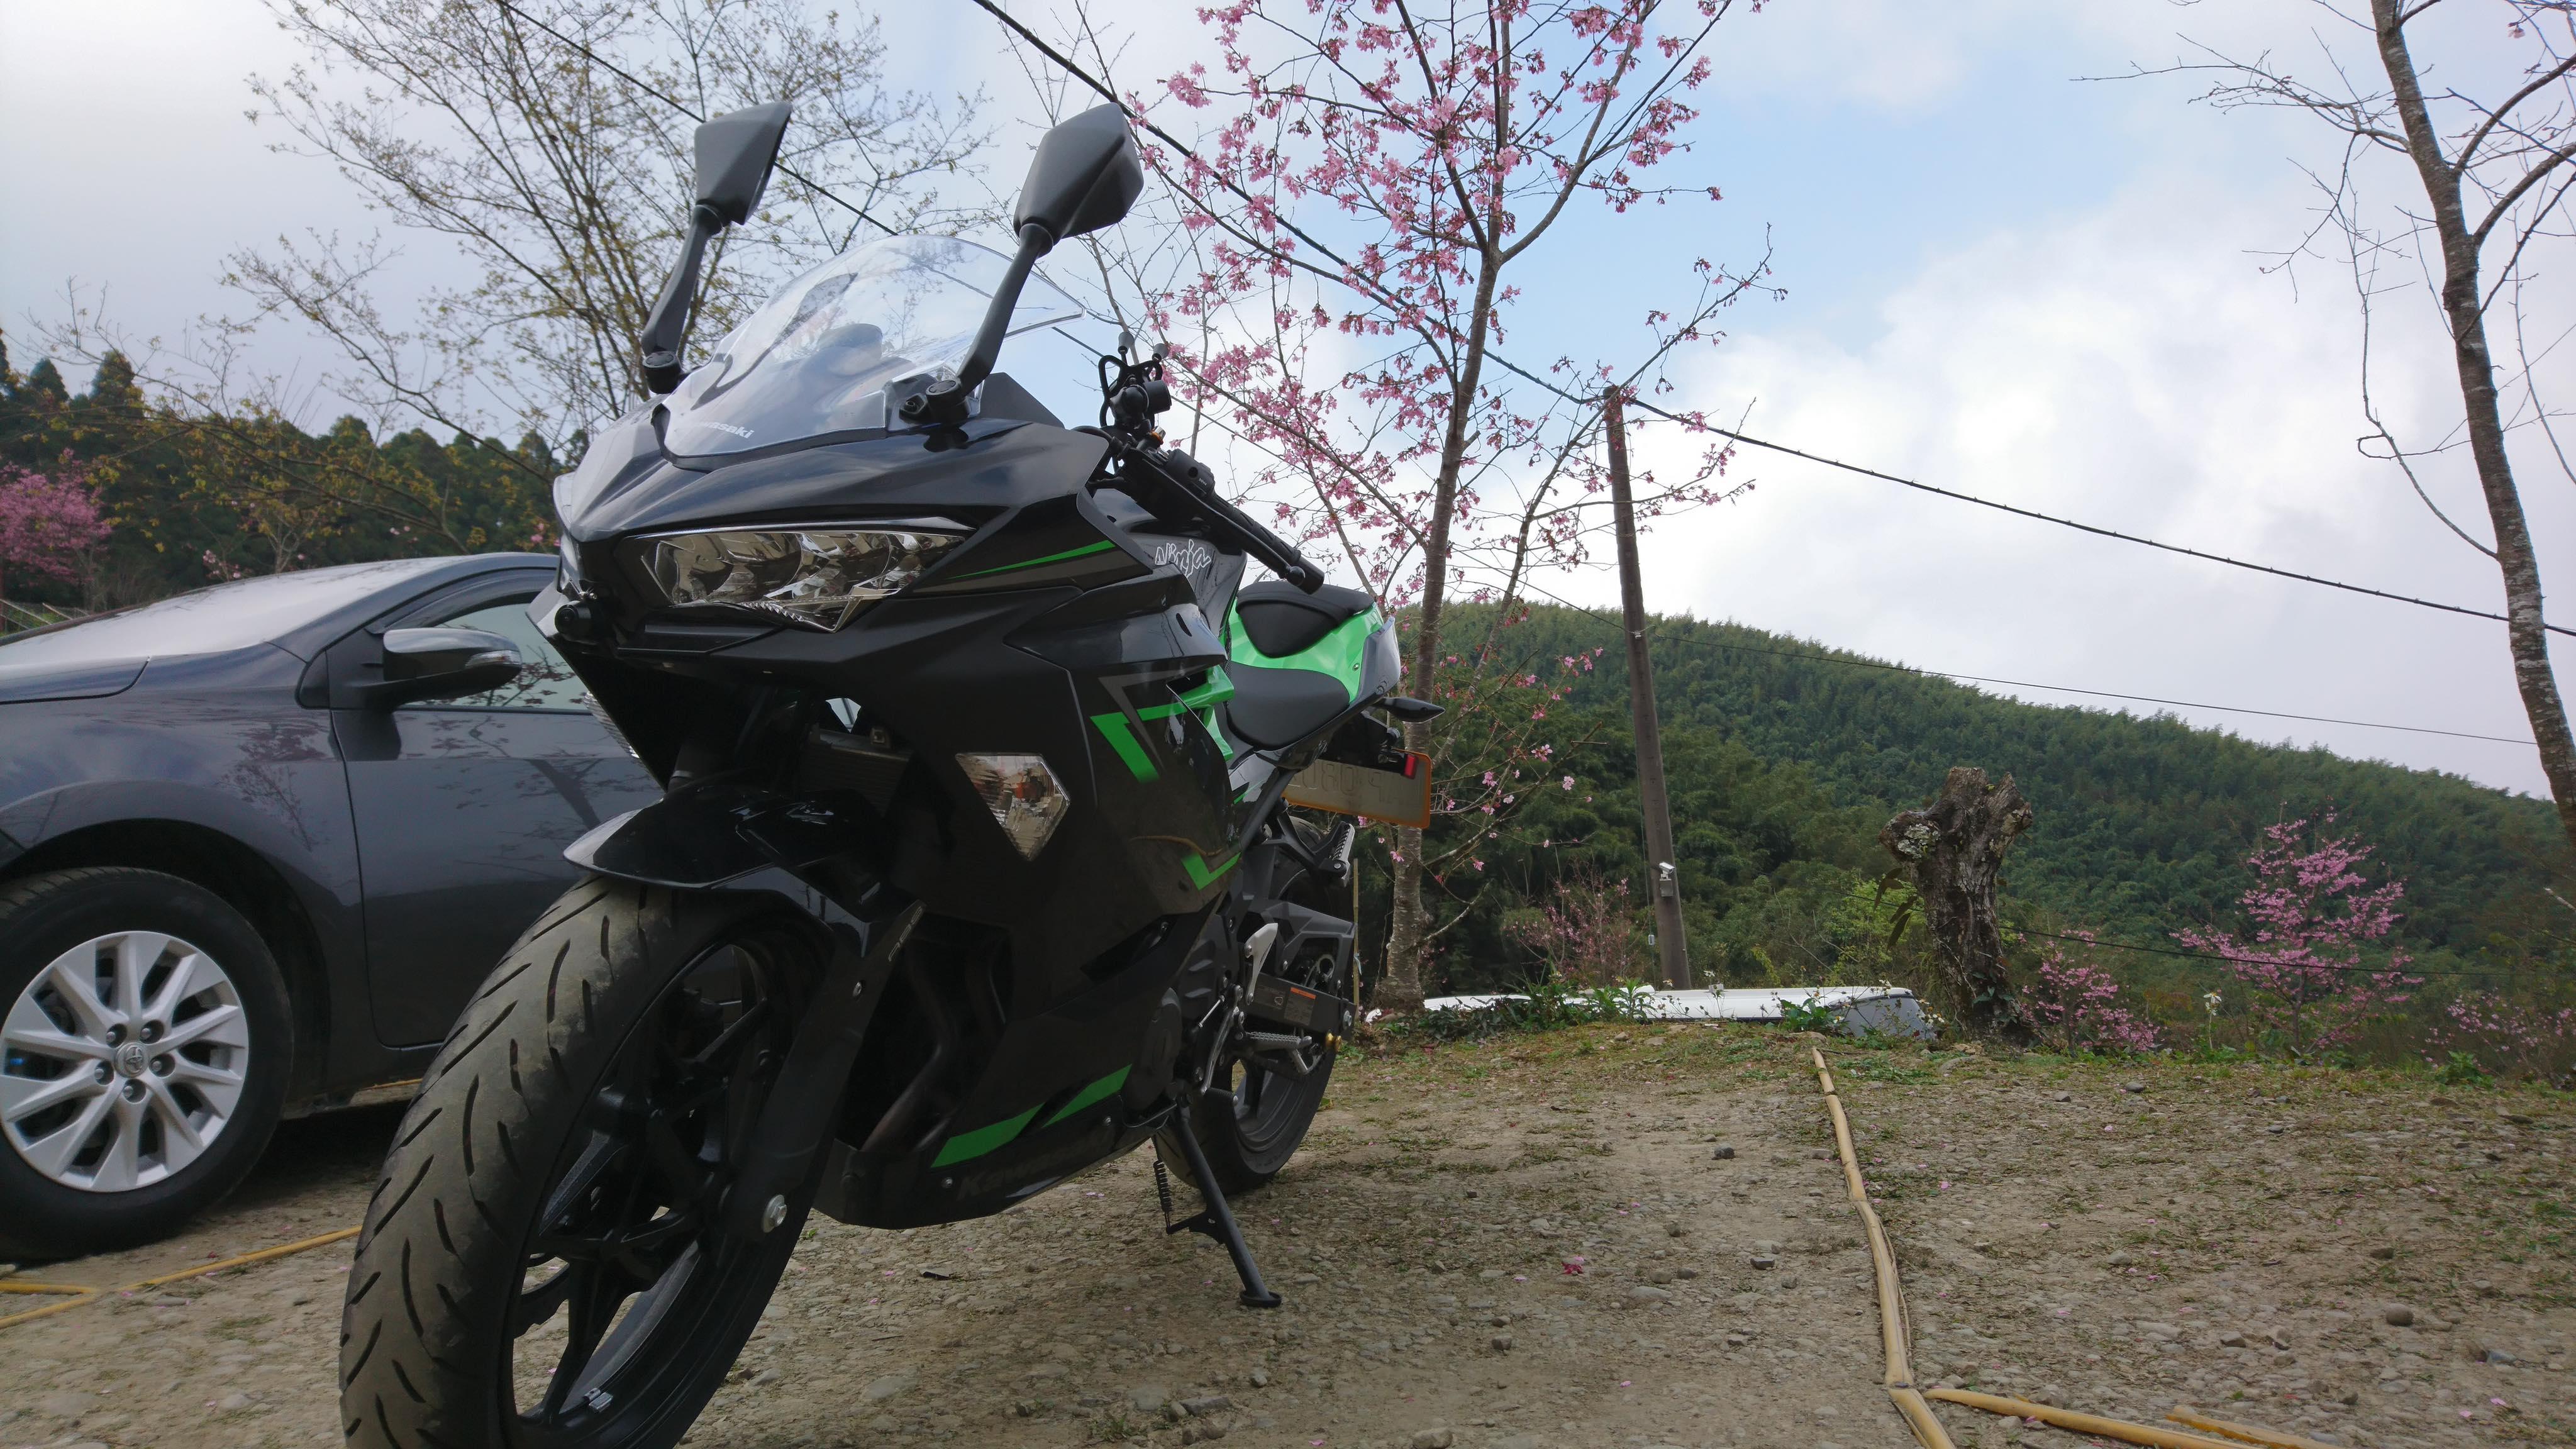 EP2 過年來點不一樣,騎車走春暢遊北台灣